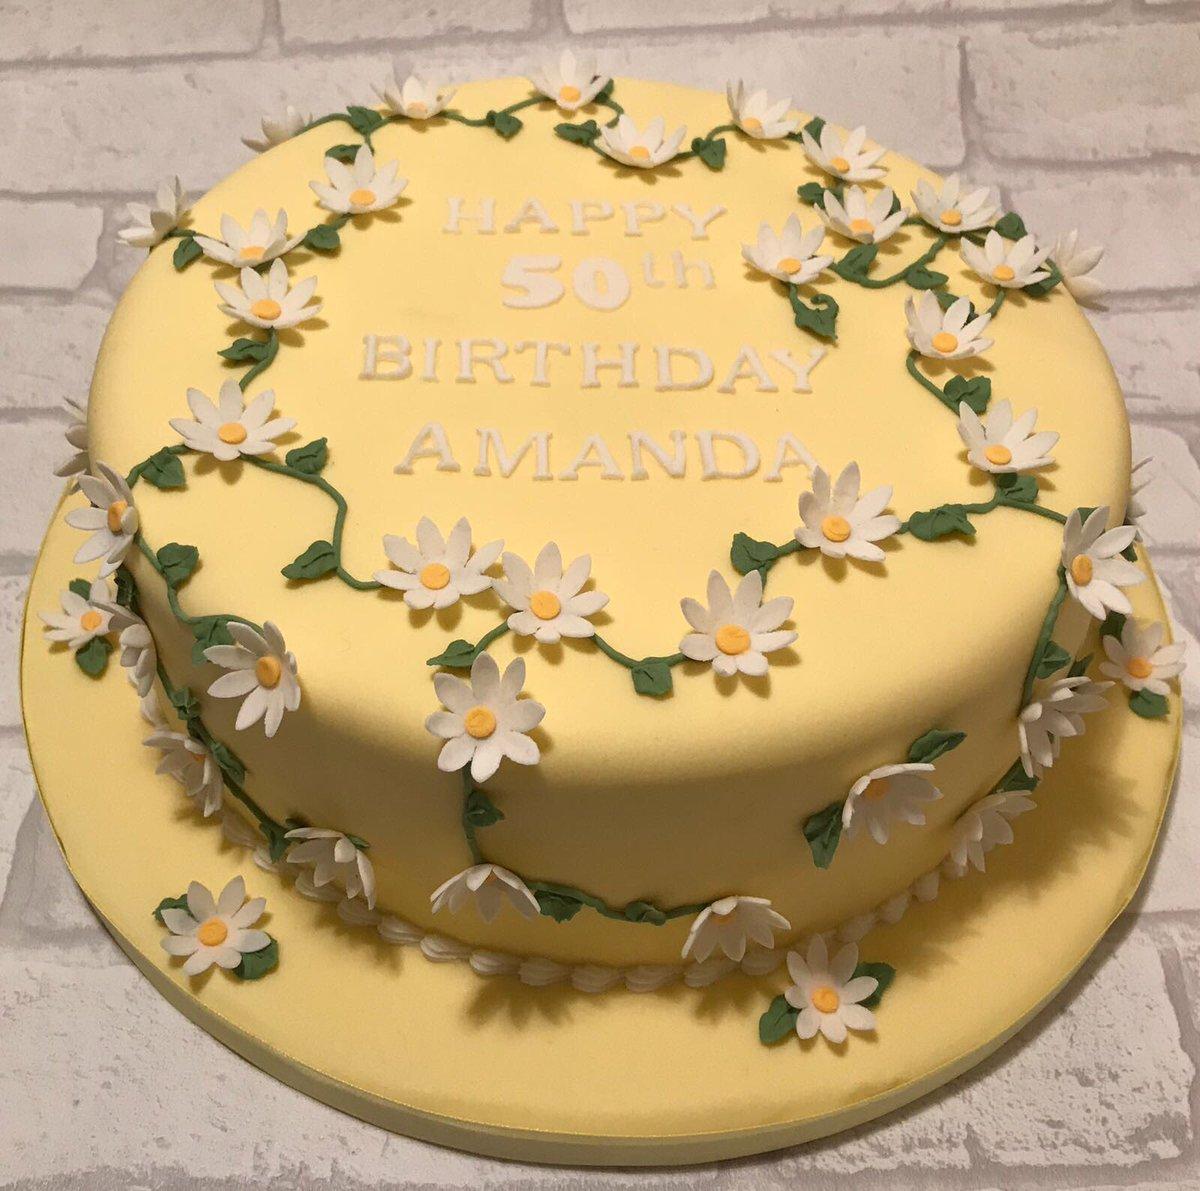 Peachy Little Flower Cakes On Twitter Pretty Daisy Birthday Cake Funny Birthday Cards Online Alyptdamsfinfo